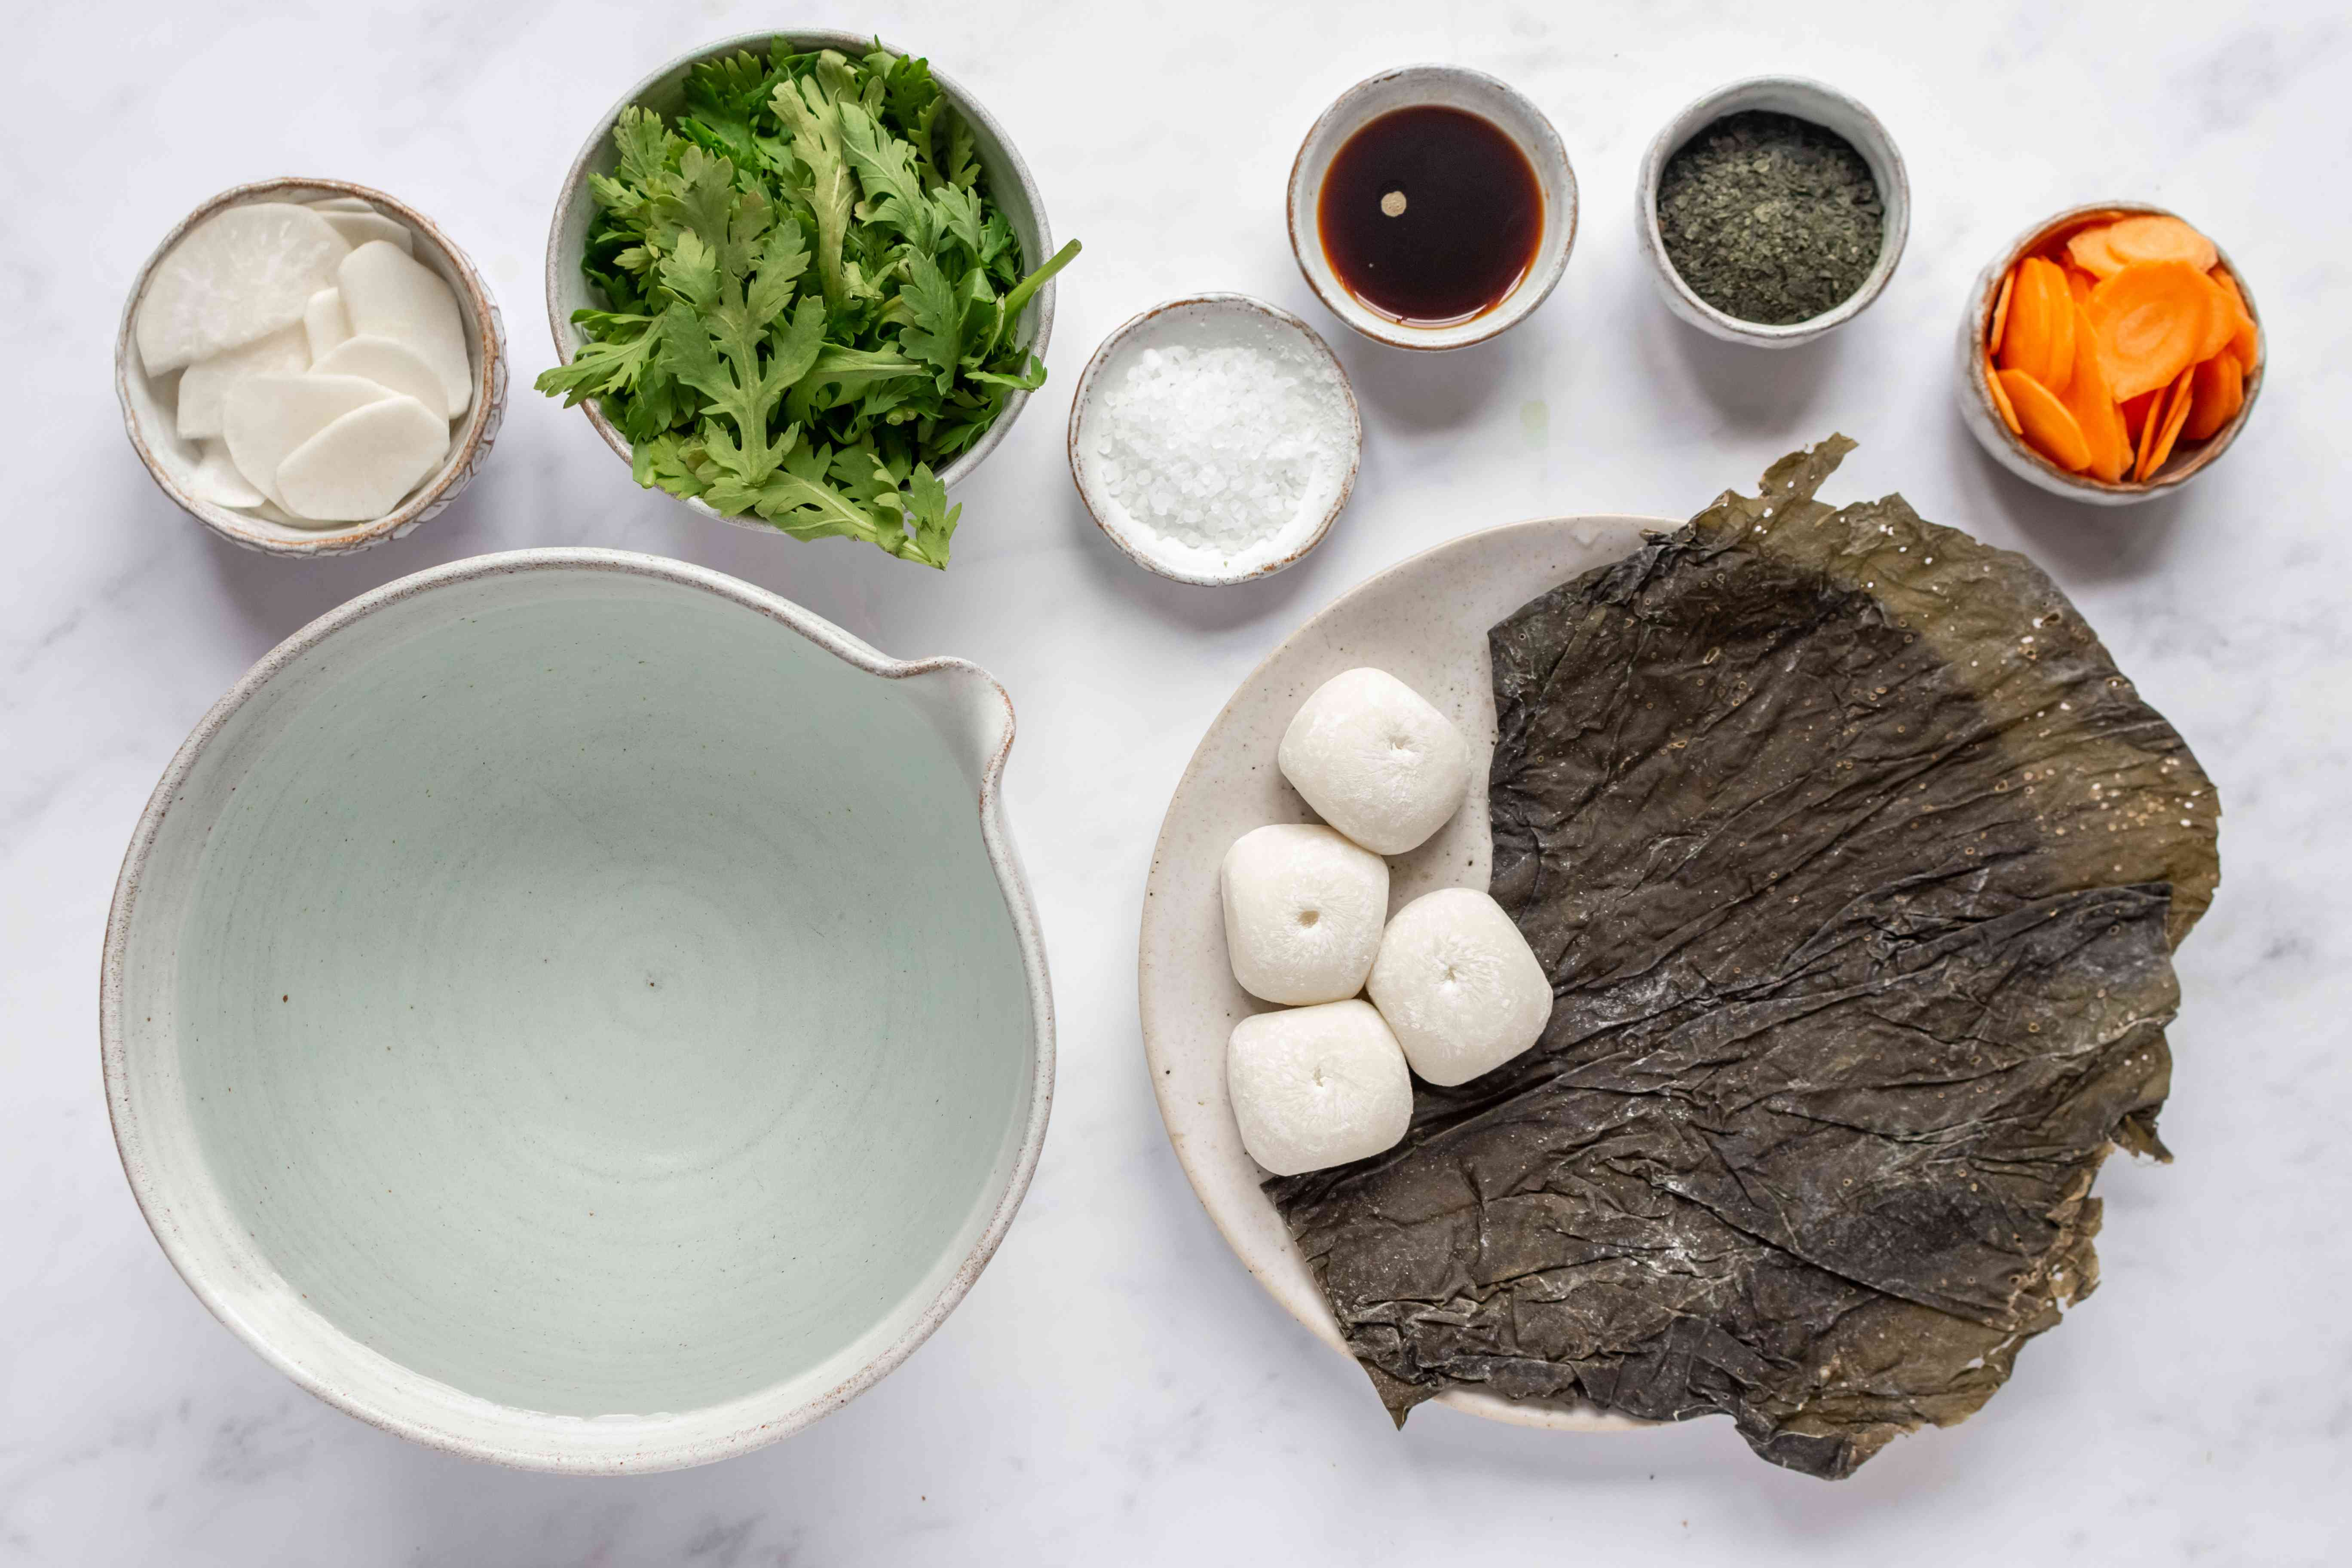 Vegan Ozoni (Japanese New Year's Soup With Rice Cake) ingredients